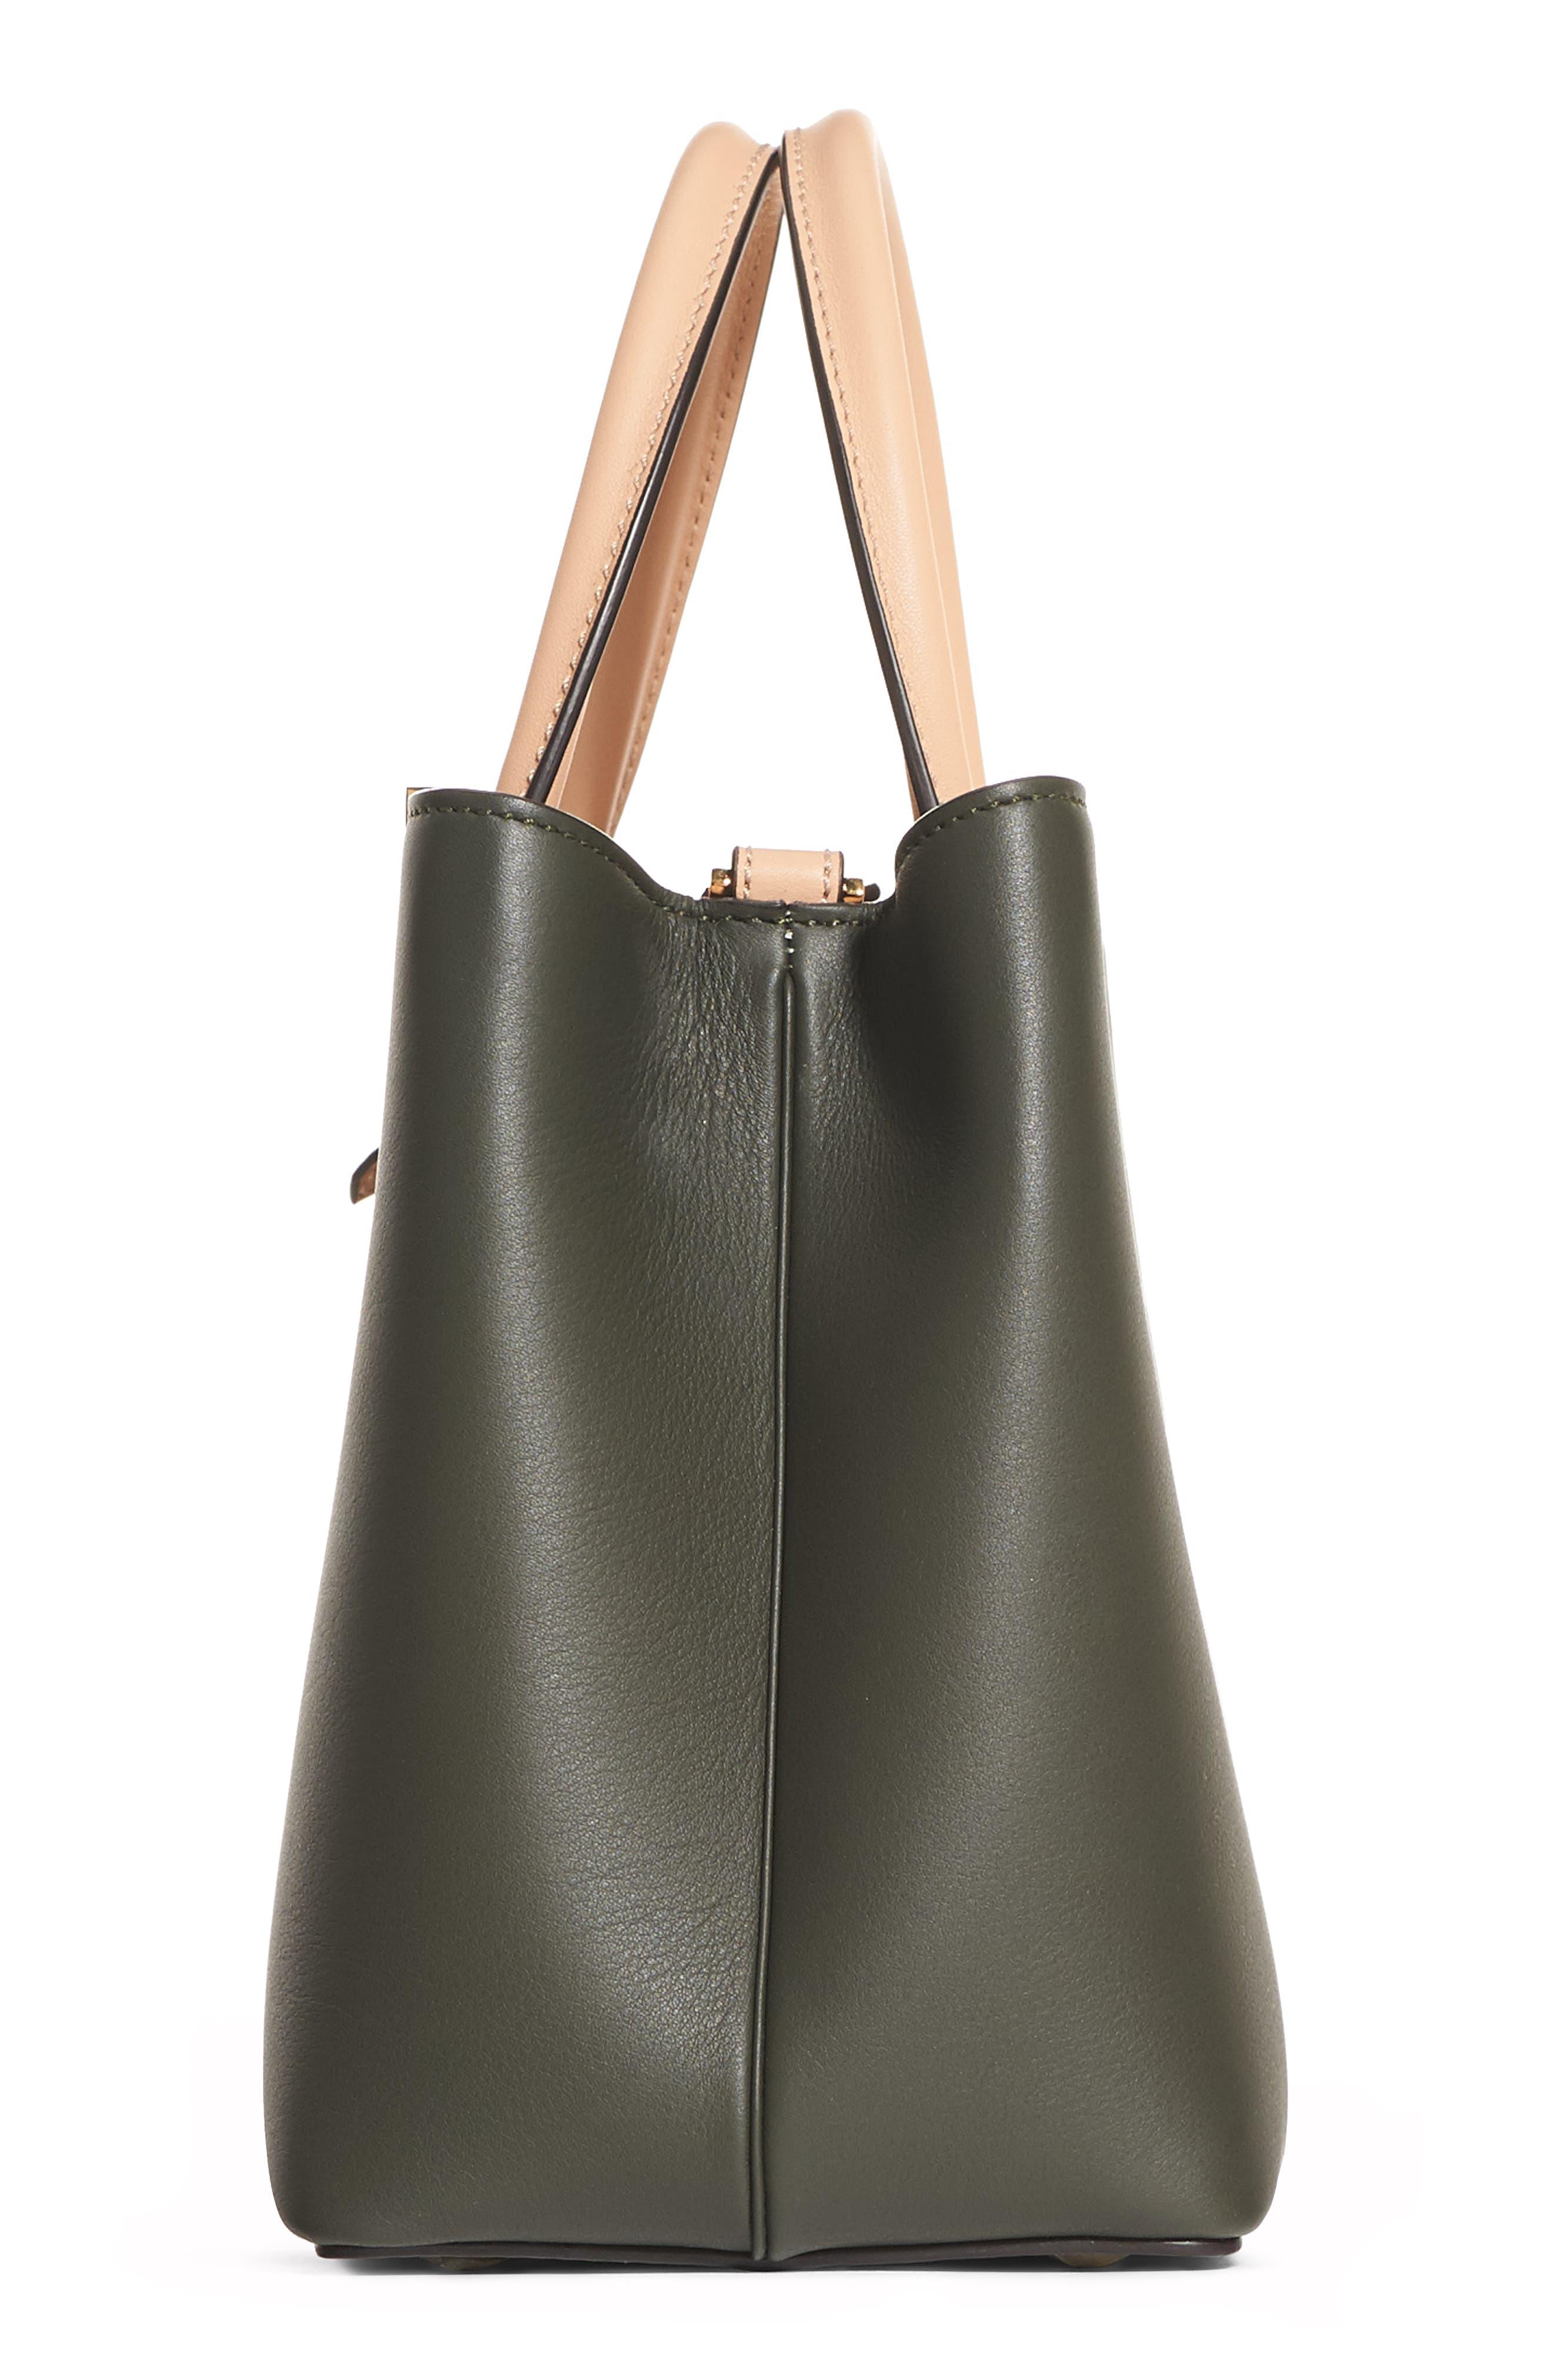 Petite 2Jours Leather Shopper,                             Alternate thumbnail 4, color,                             GREEN GRASS/MAKEUP